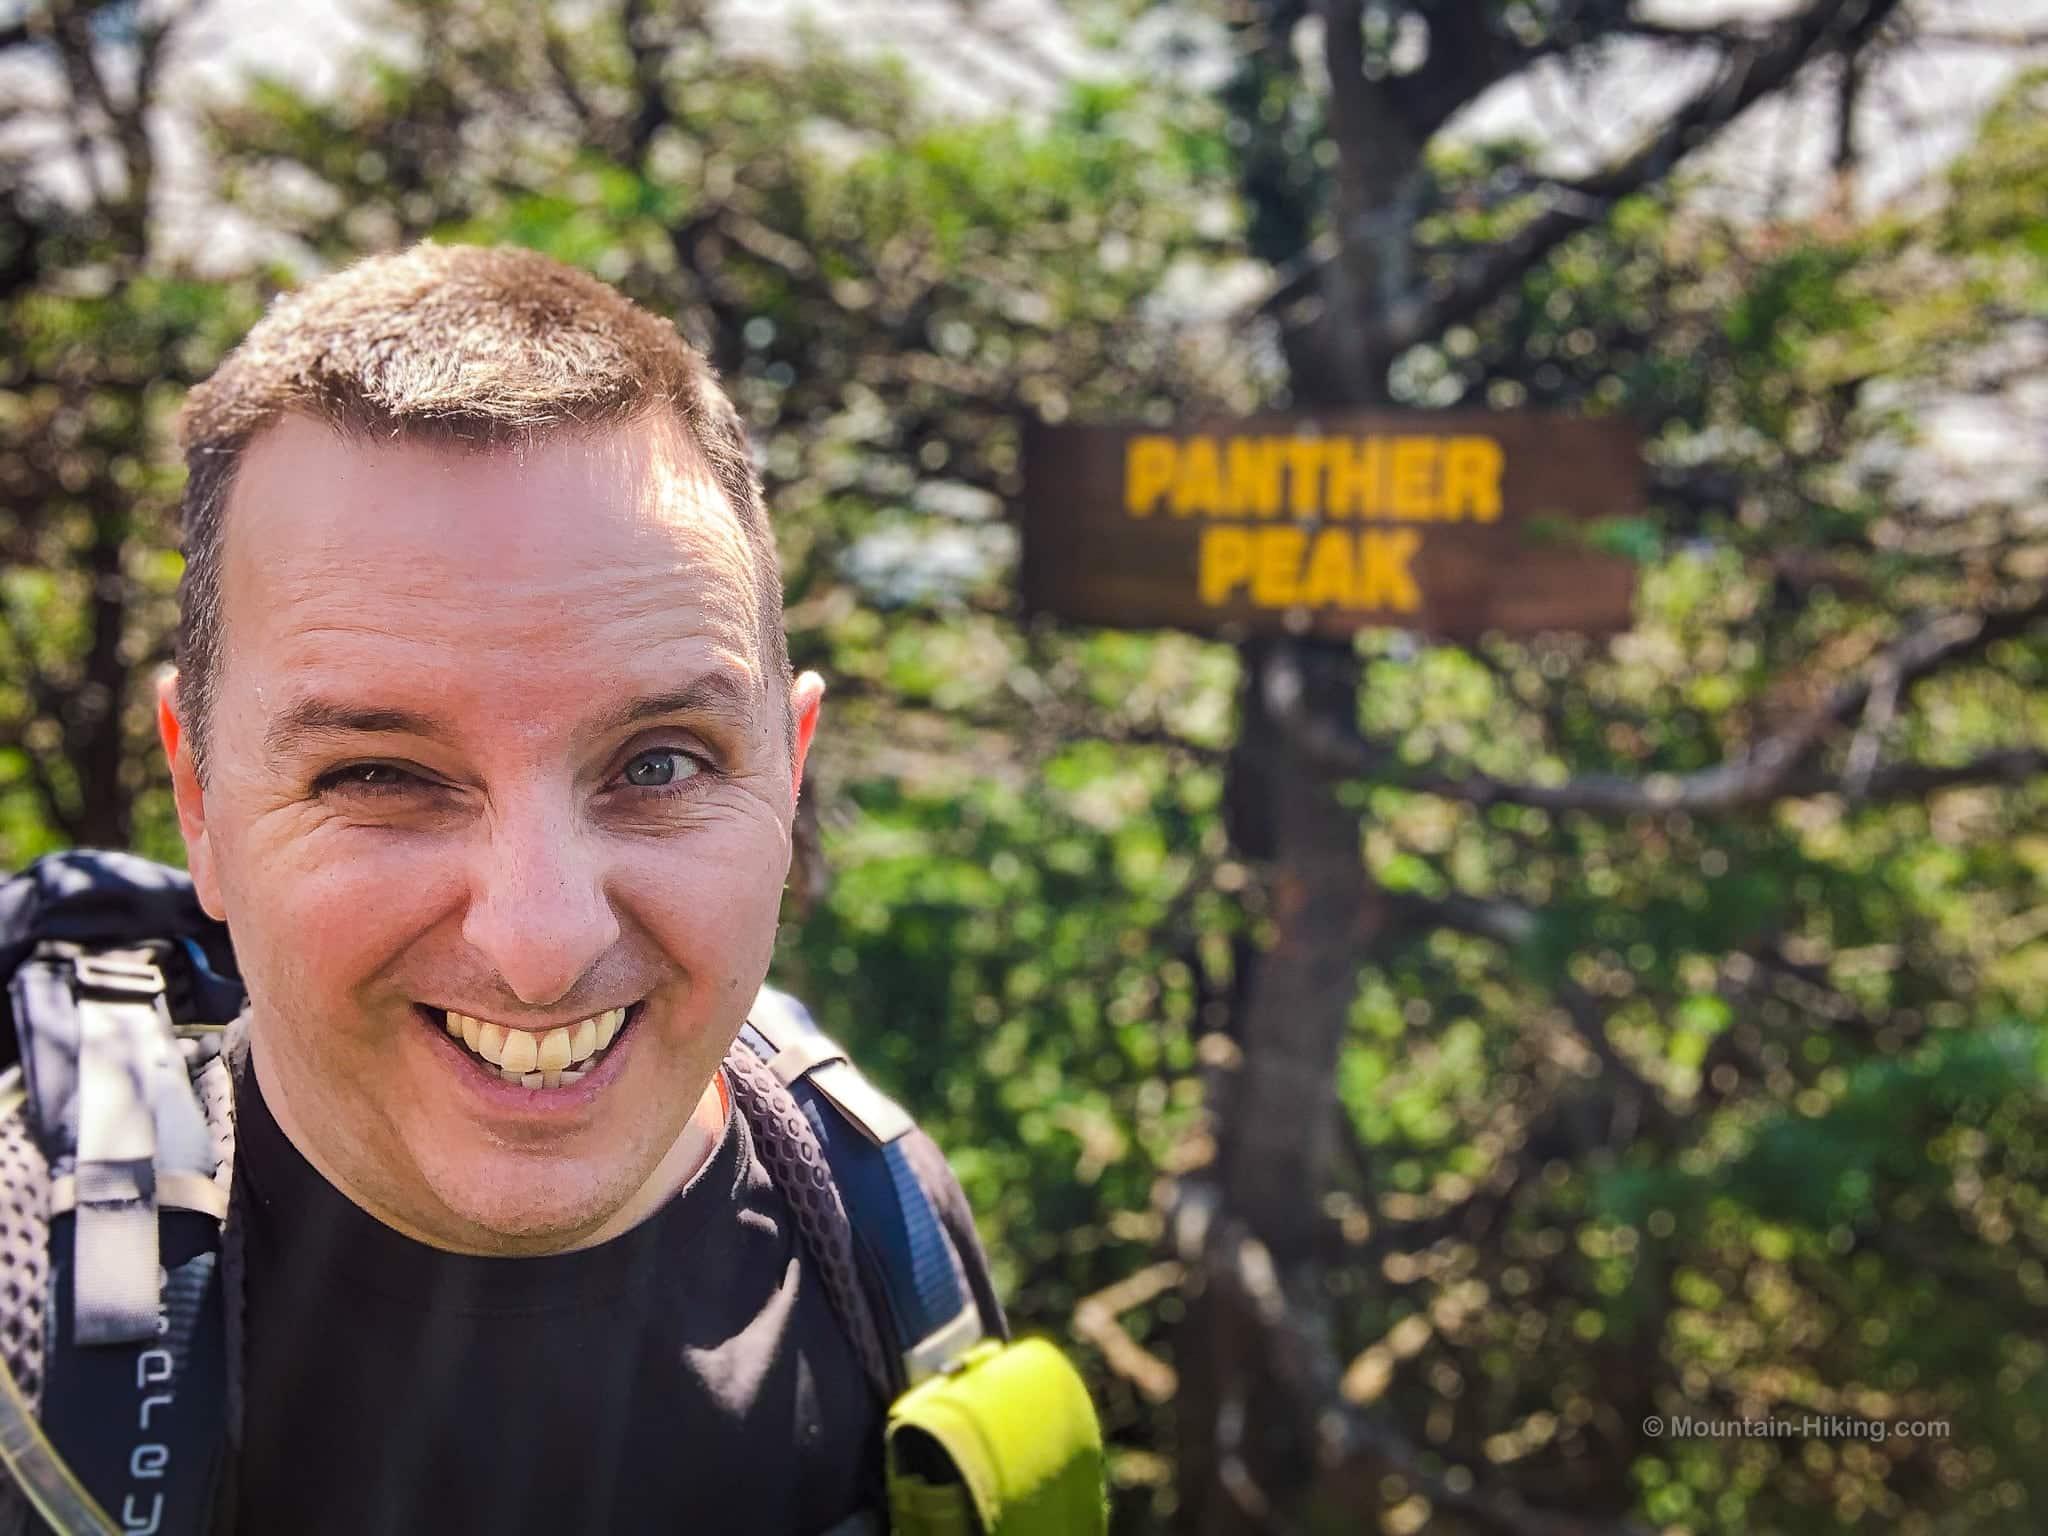 Hiker at summit of Panther Peak in the Adirondacks